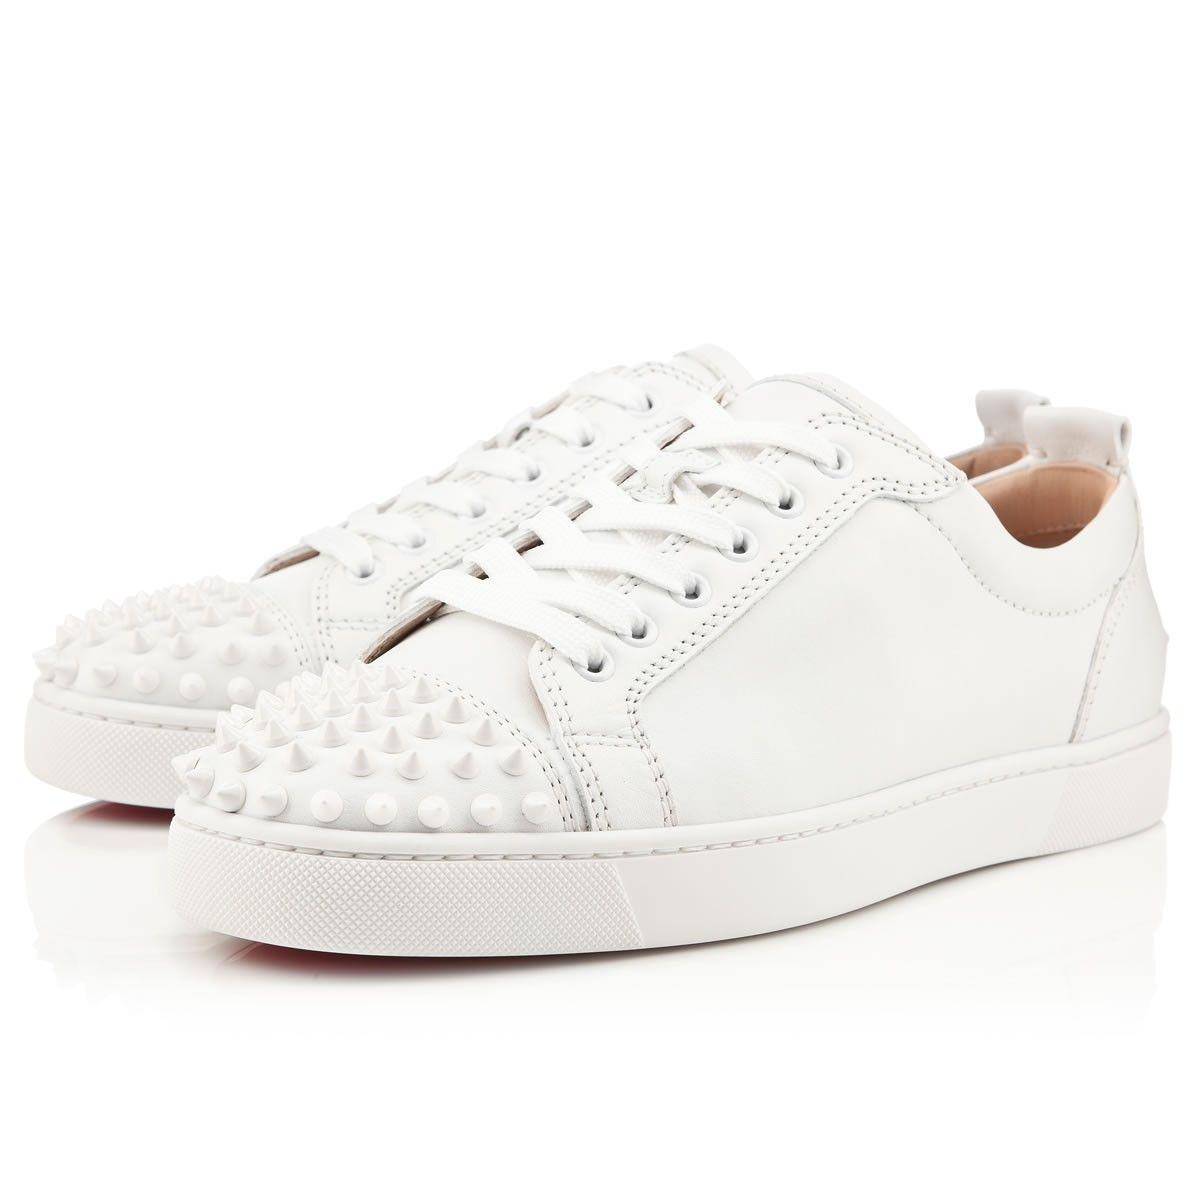 LOUIS JUNIOR SPIKES FLAT White/White Calf - Men Shoes - Christian Louboutin